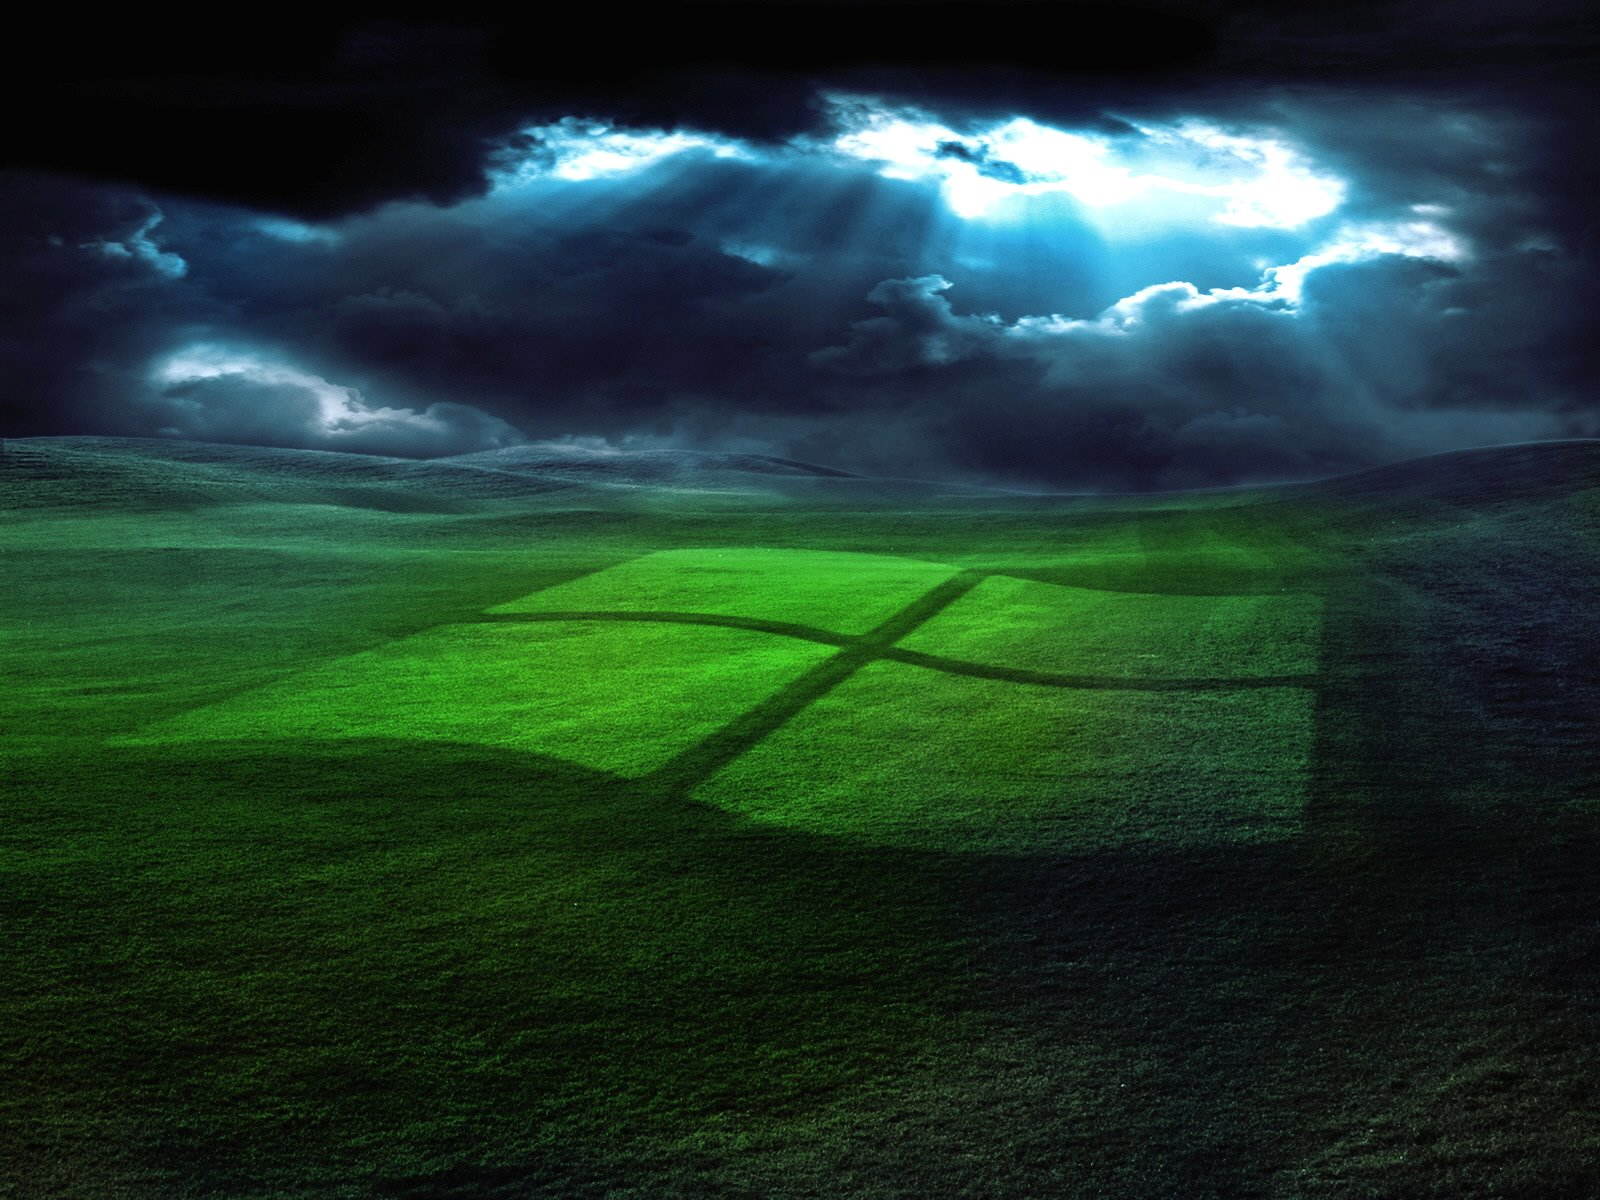 Bancomat, allarme sicurezza senza Windows Xp